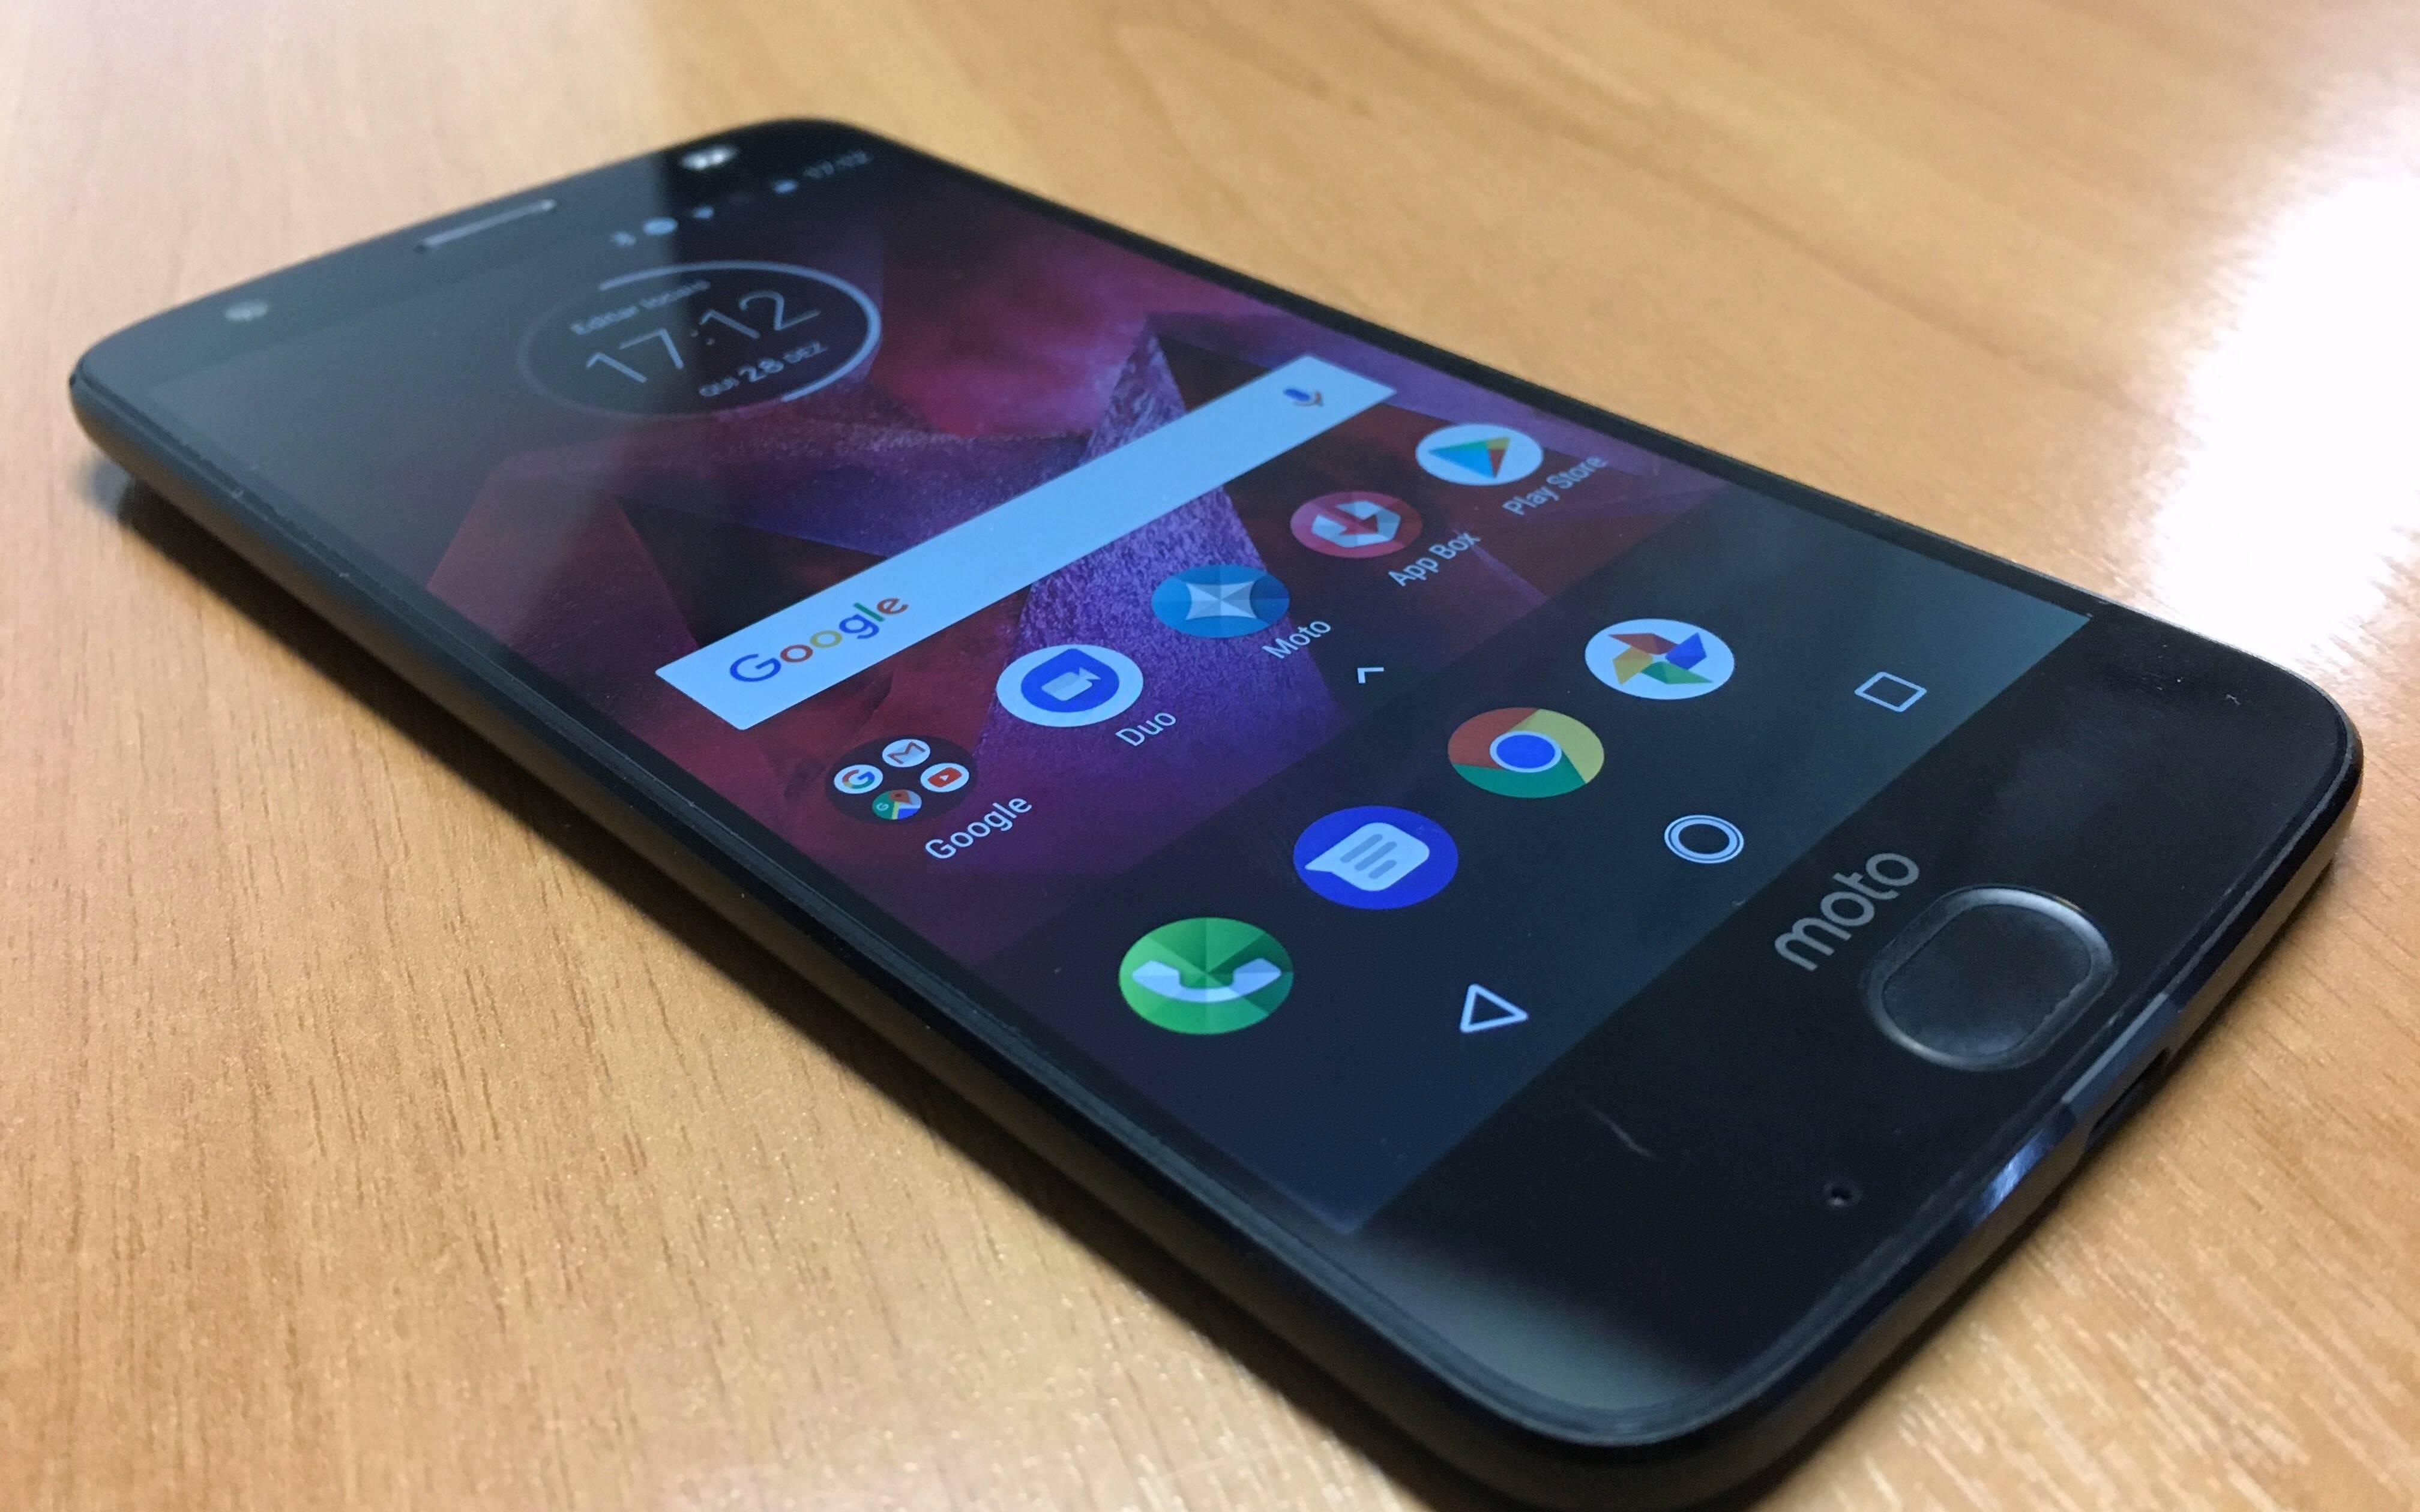 Moto Z2 Force tem preço sugerido de R$ 2.499 pela Motorola. Foto: Guilherme Parolim/Brasil Econômico